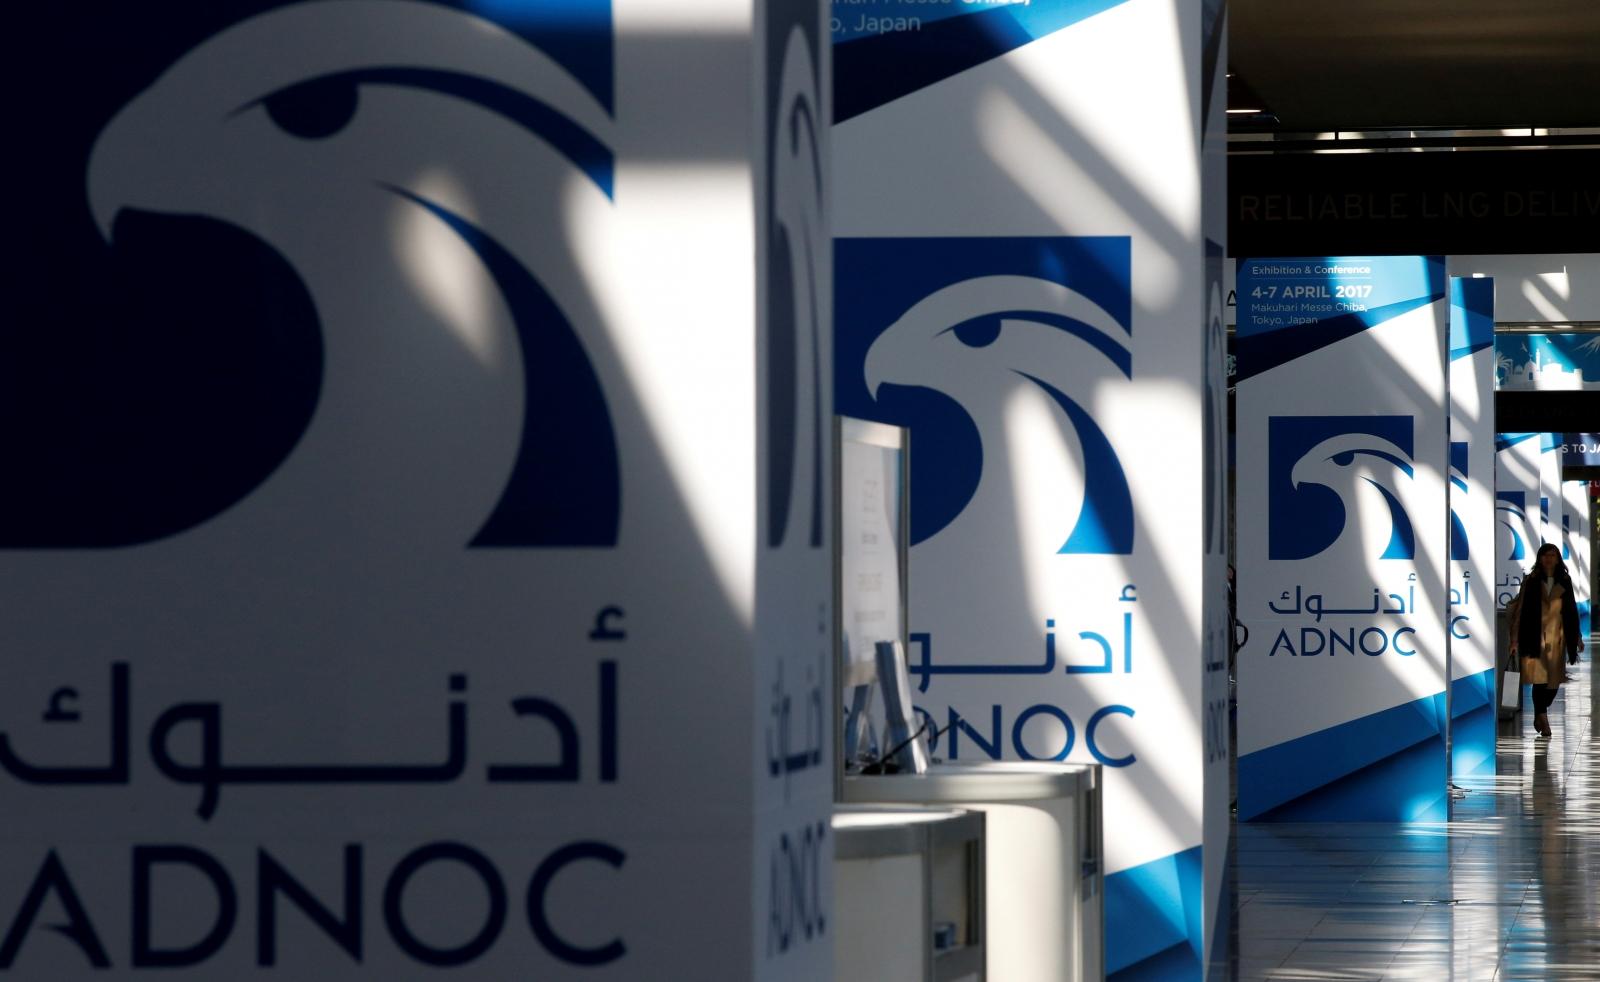 Abu Dhabi National Oil Company adnoc logo